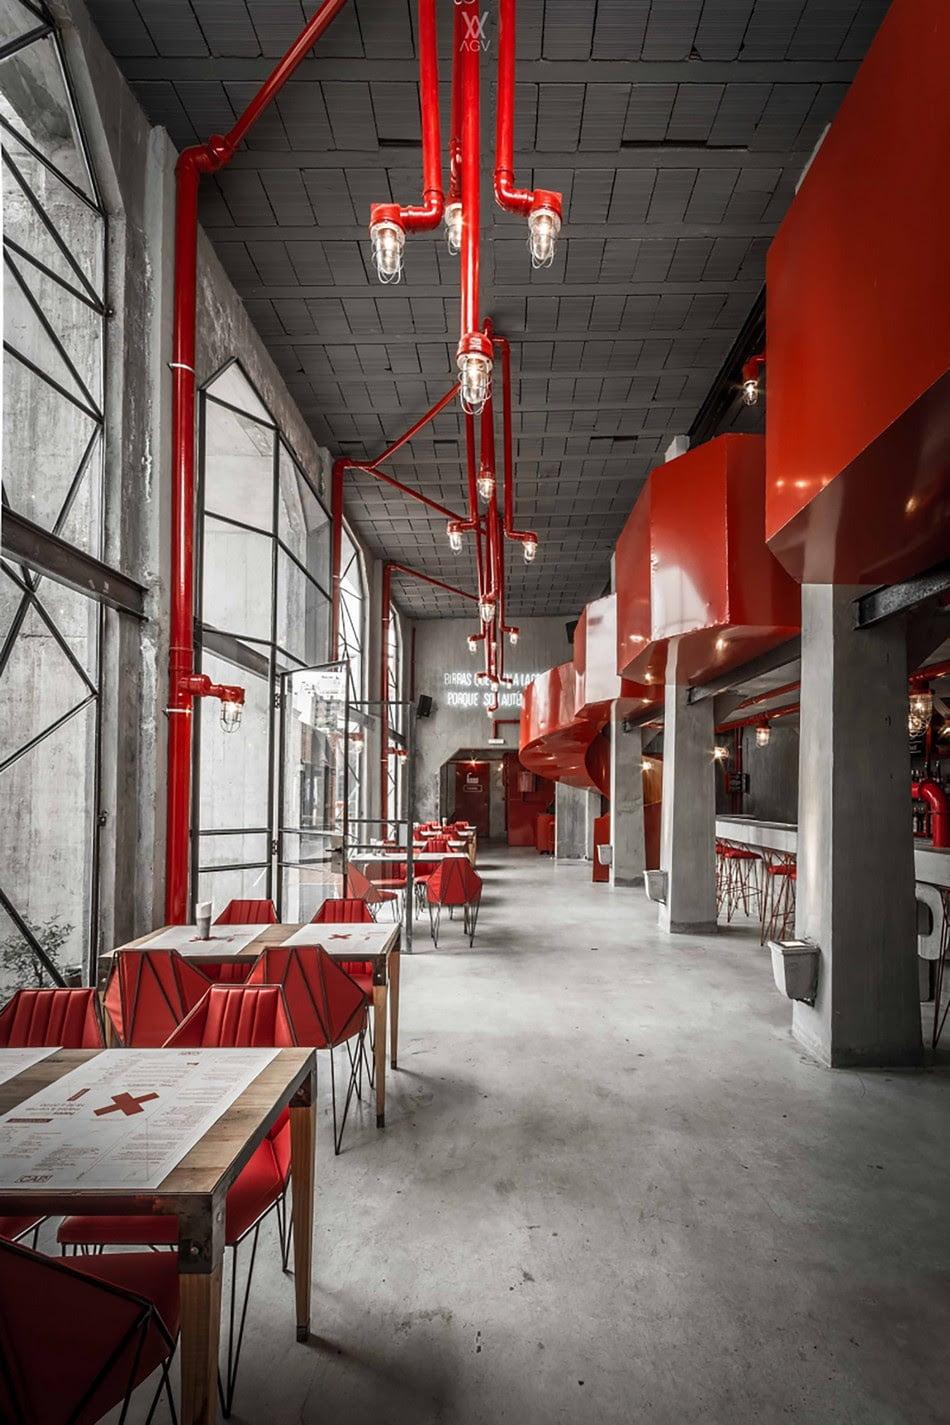 Industrial Interior Design: Vintage Industrial Style Interior Design Of Brewery In